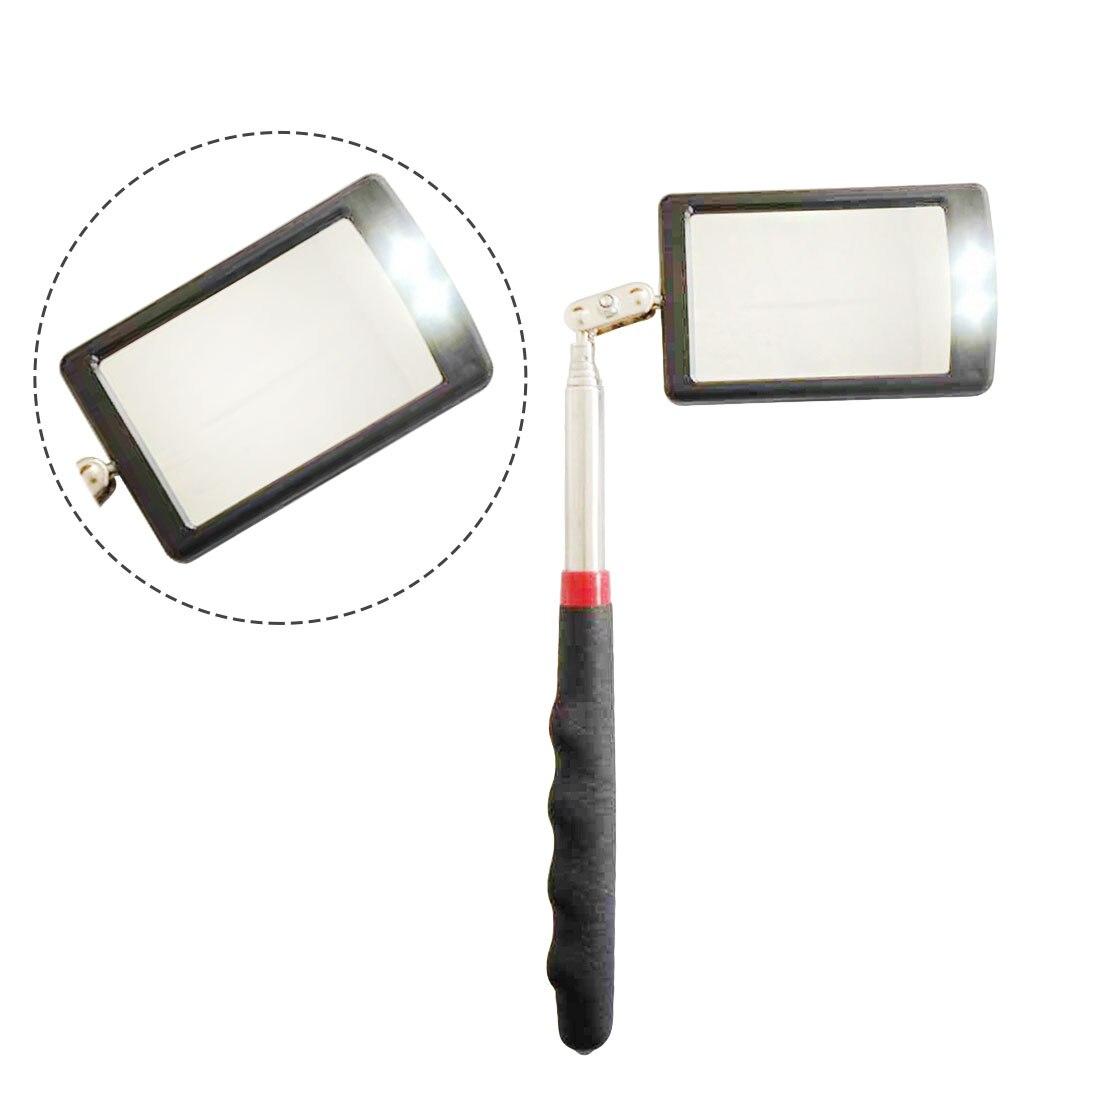 Car Angle View Pen Automotive Telescopic Detection Lens Telescoping Inspection Mirror Extending Flexible Adjustable